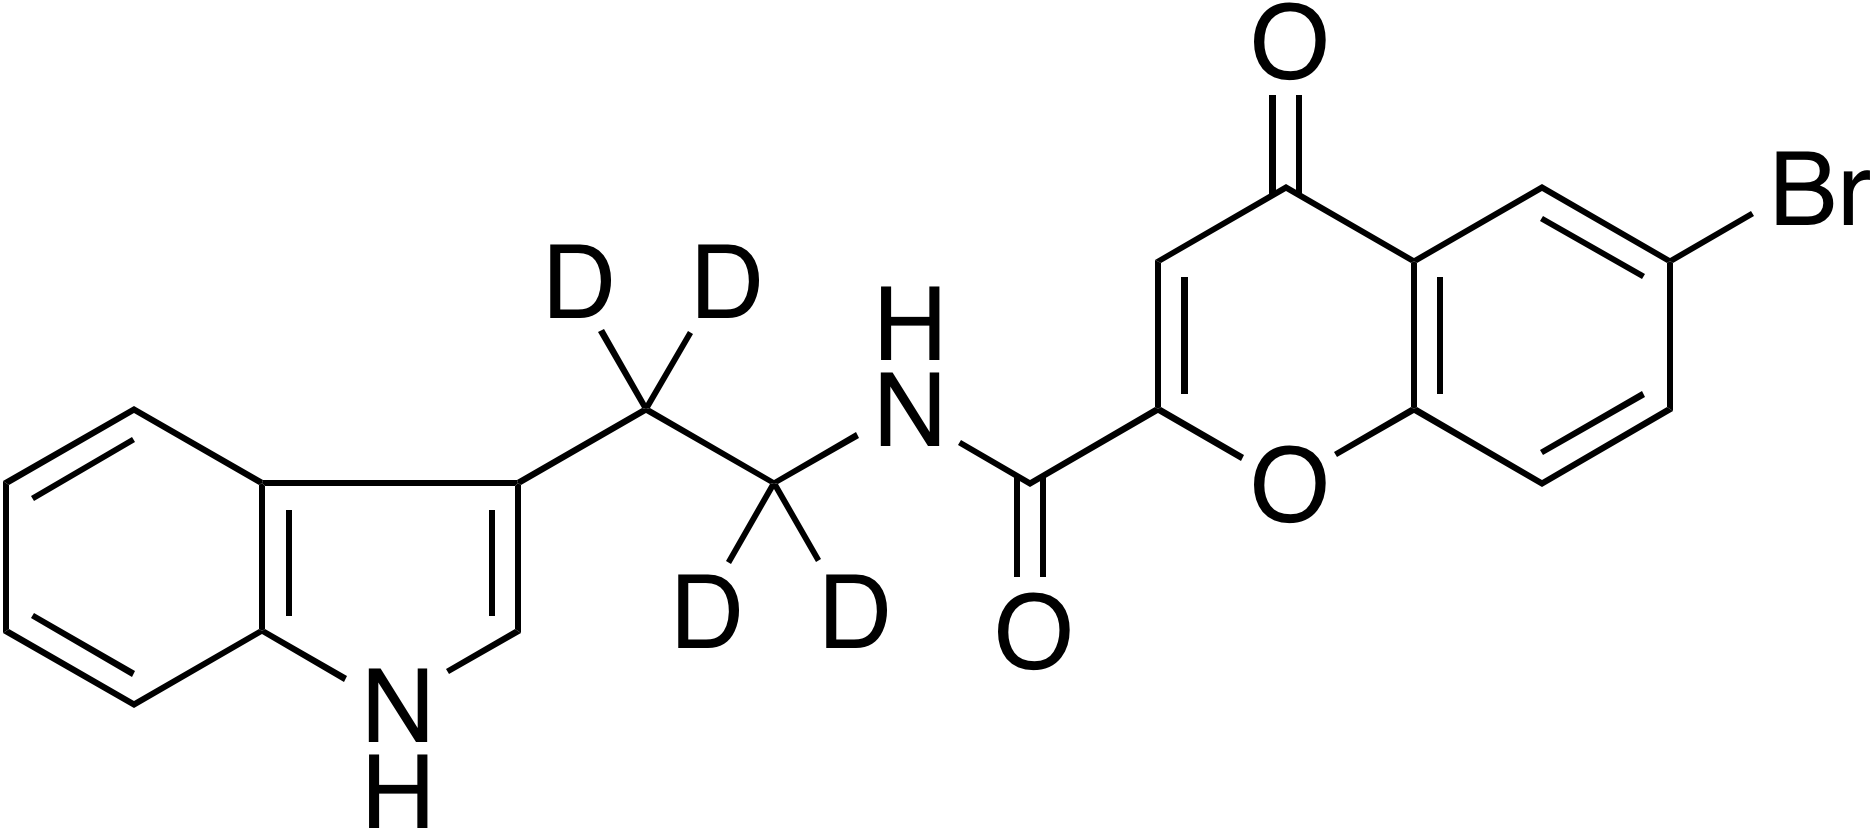 N-(2-(1H-Indol-3-yl)ethyl-d<sub>4</sub>)-6-bromo-4-oxo-4H-chromene-2-carboxamide